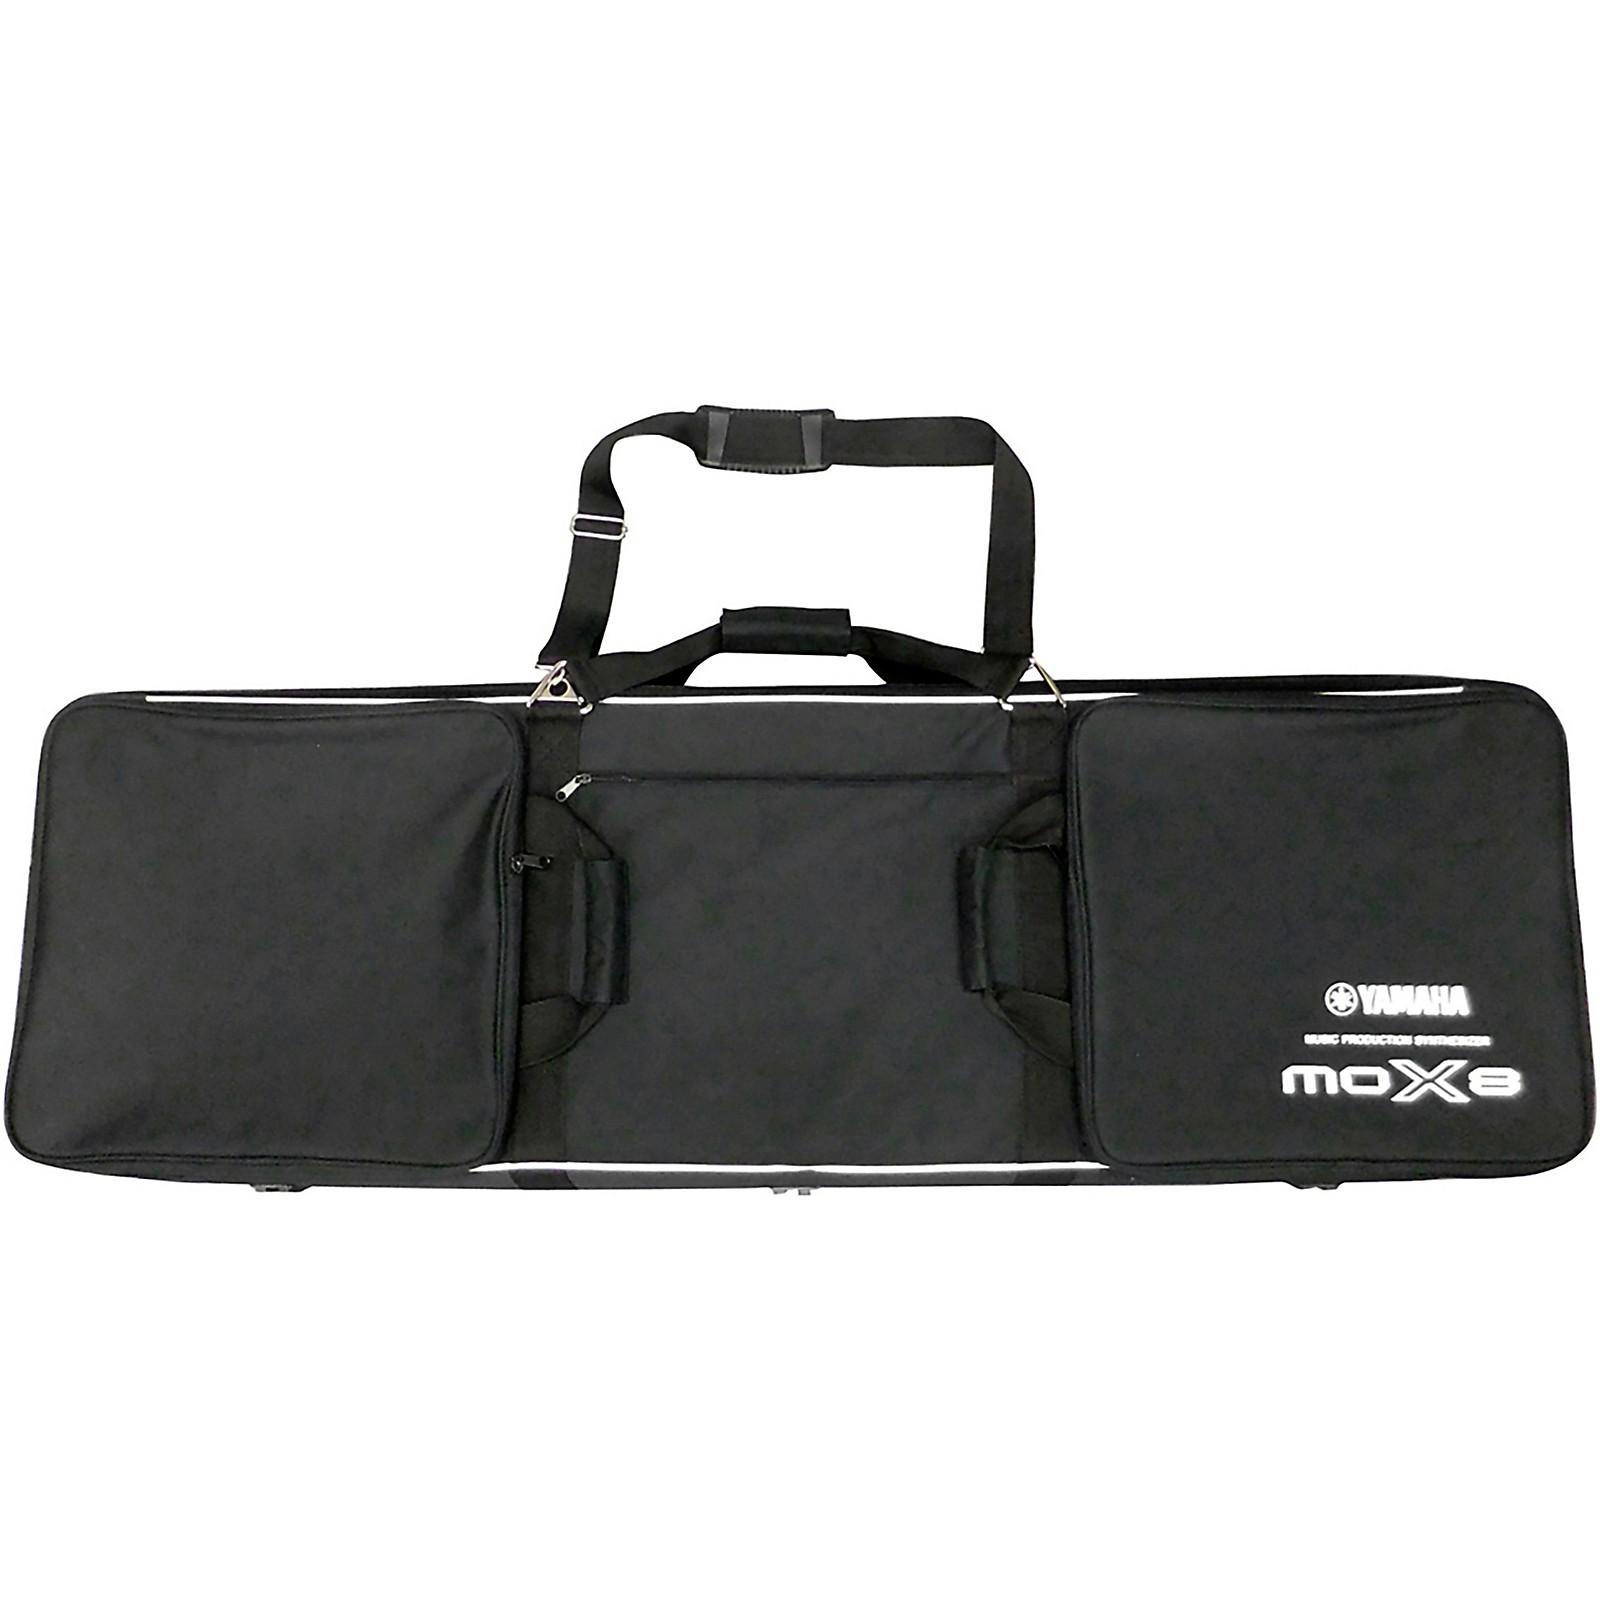 Yamaha YSCMOXF8-MX88 Bag With Wheels for MOXF8 or MX88